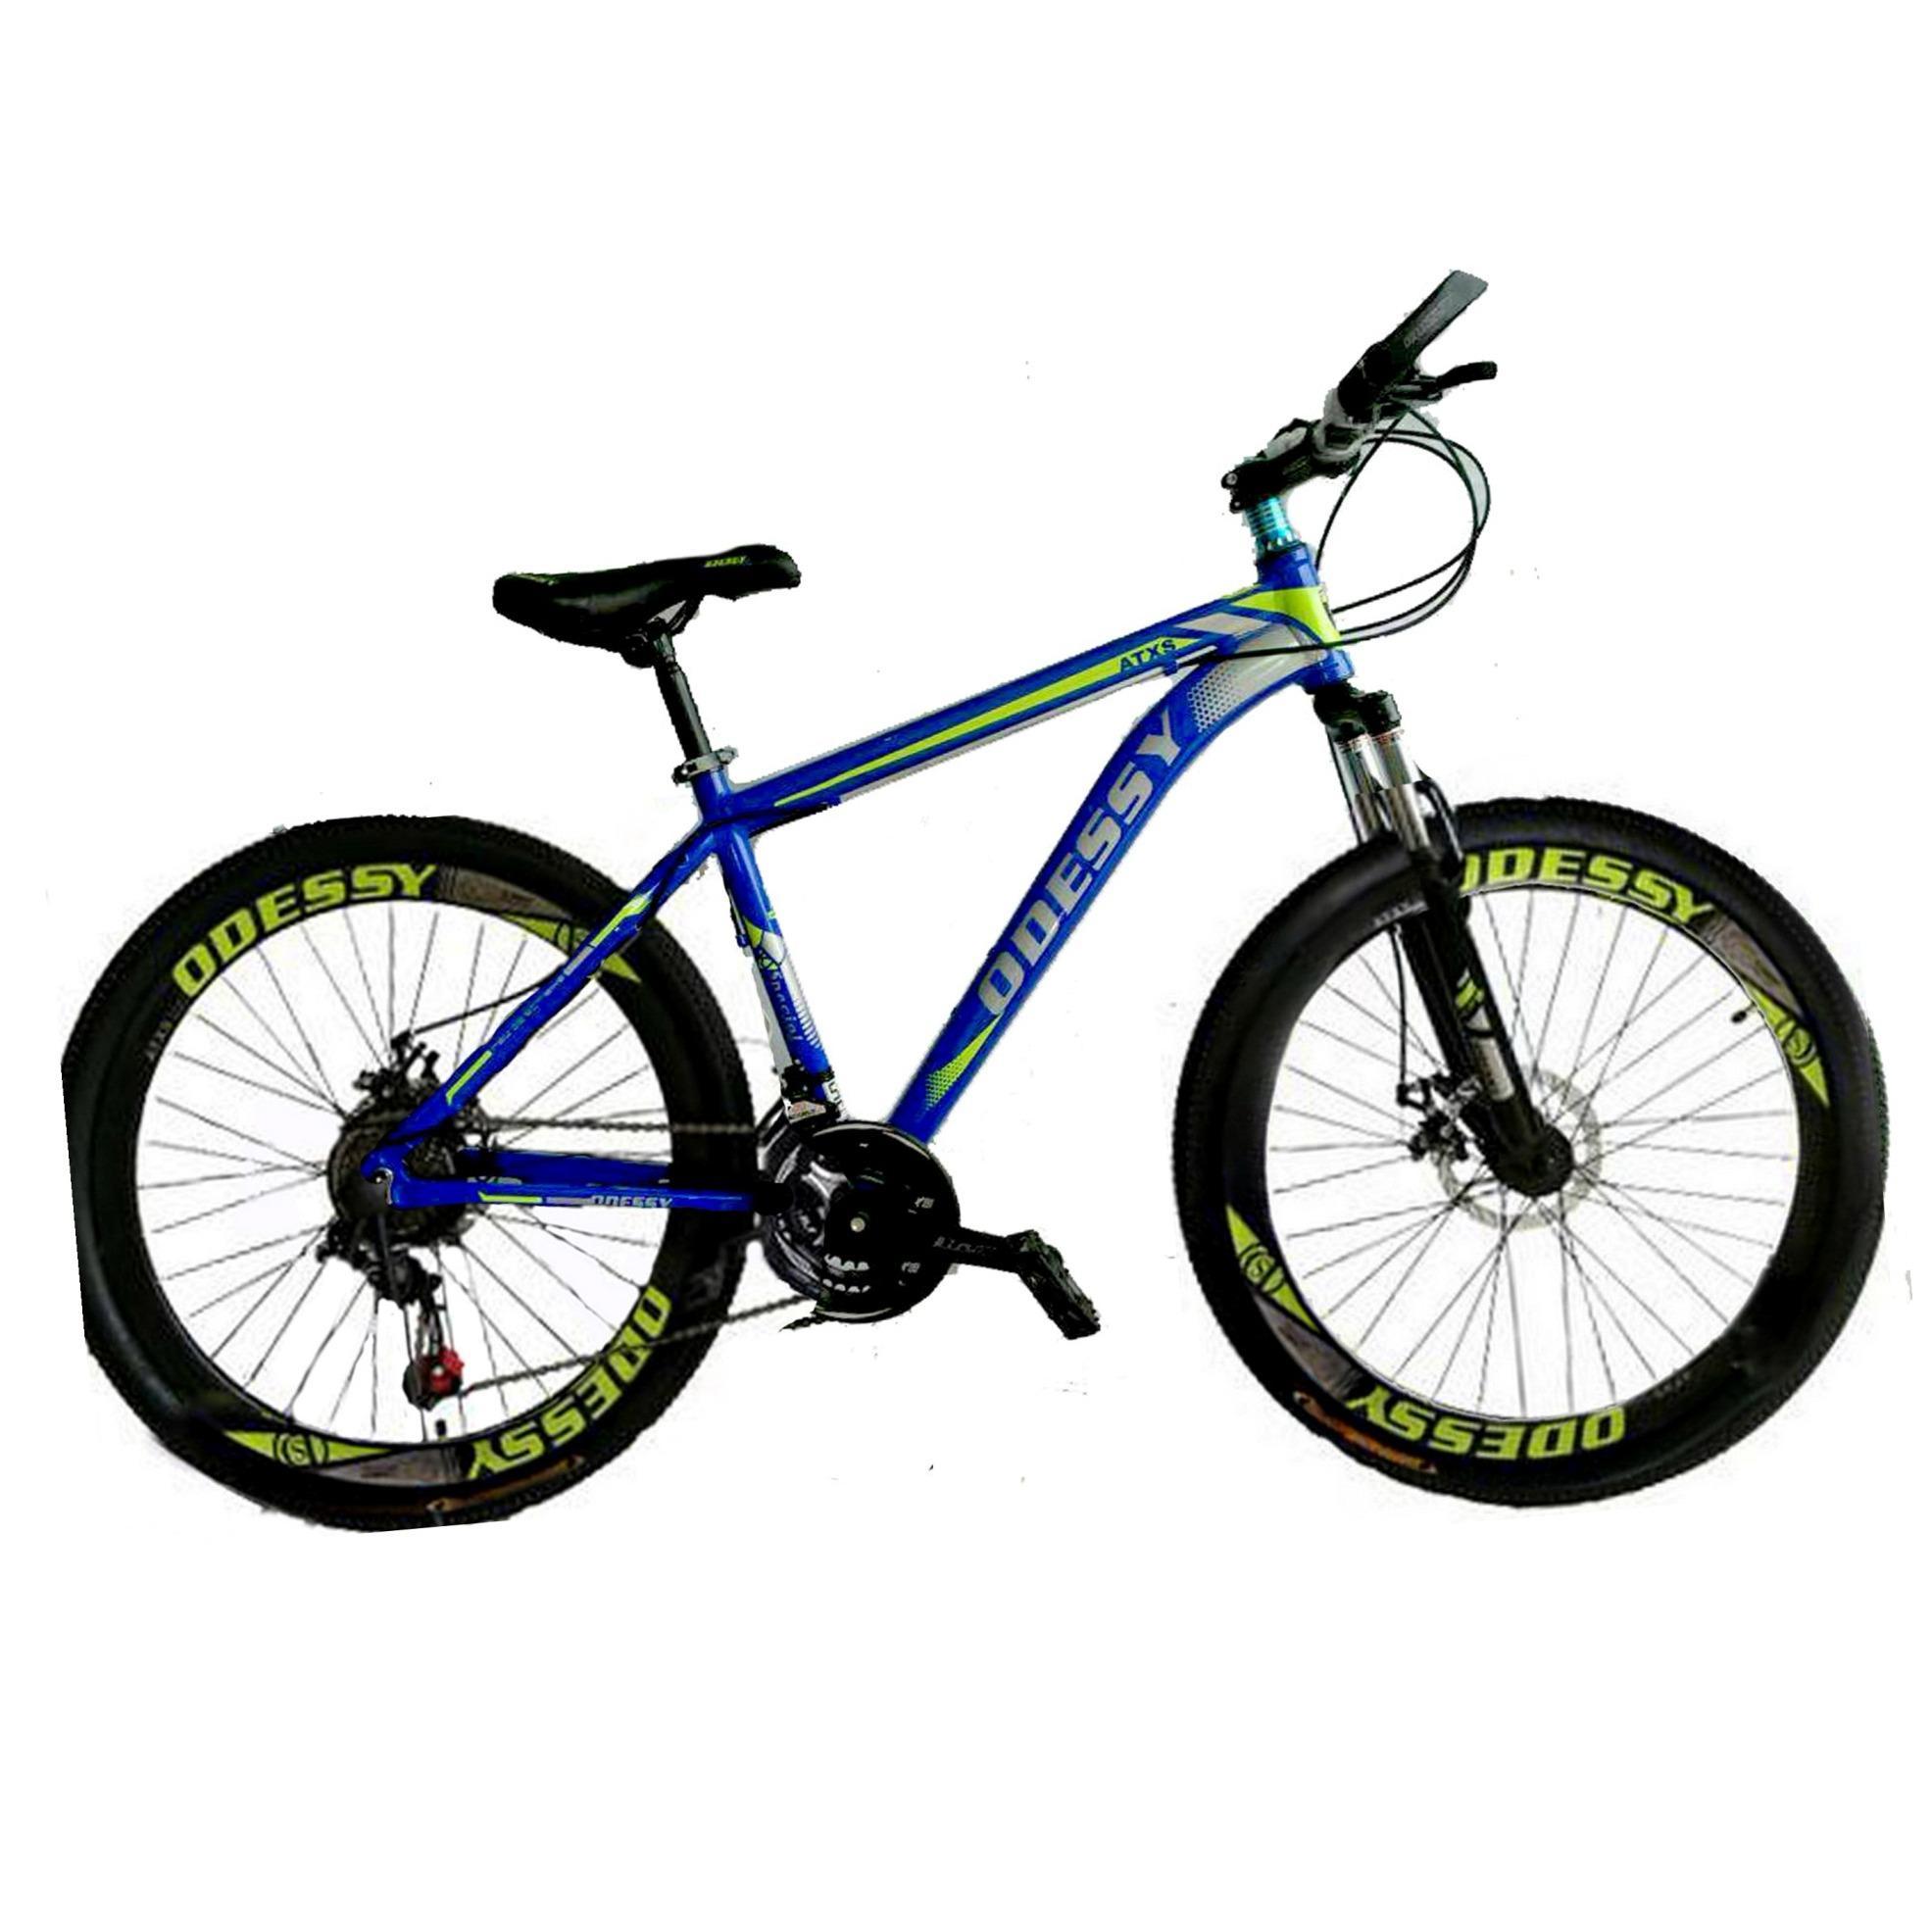 Odessy Atxs 500 MTB Alloy Sporty Sepeda Gunung MTB 26  - Blue Electrik (KHUSUS PULAU JAWA)